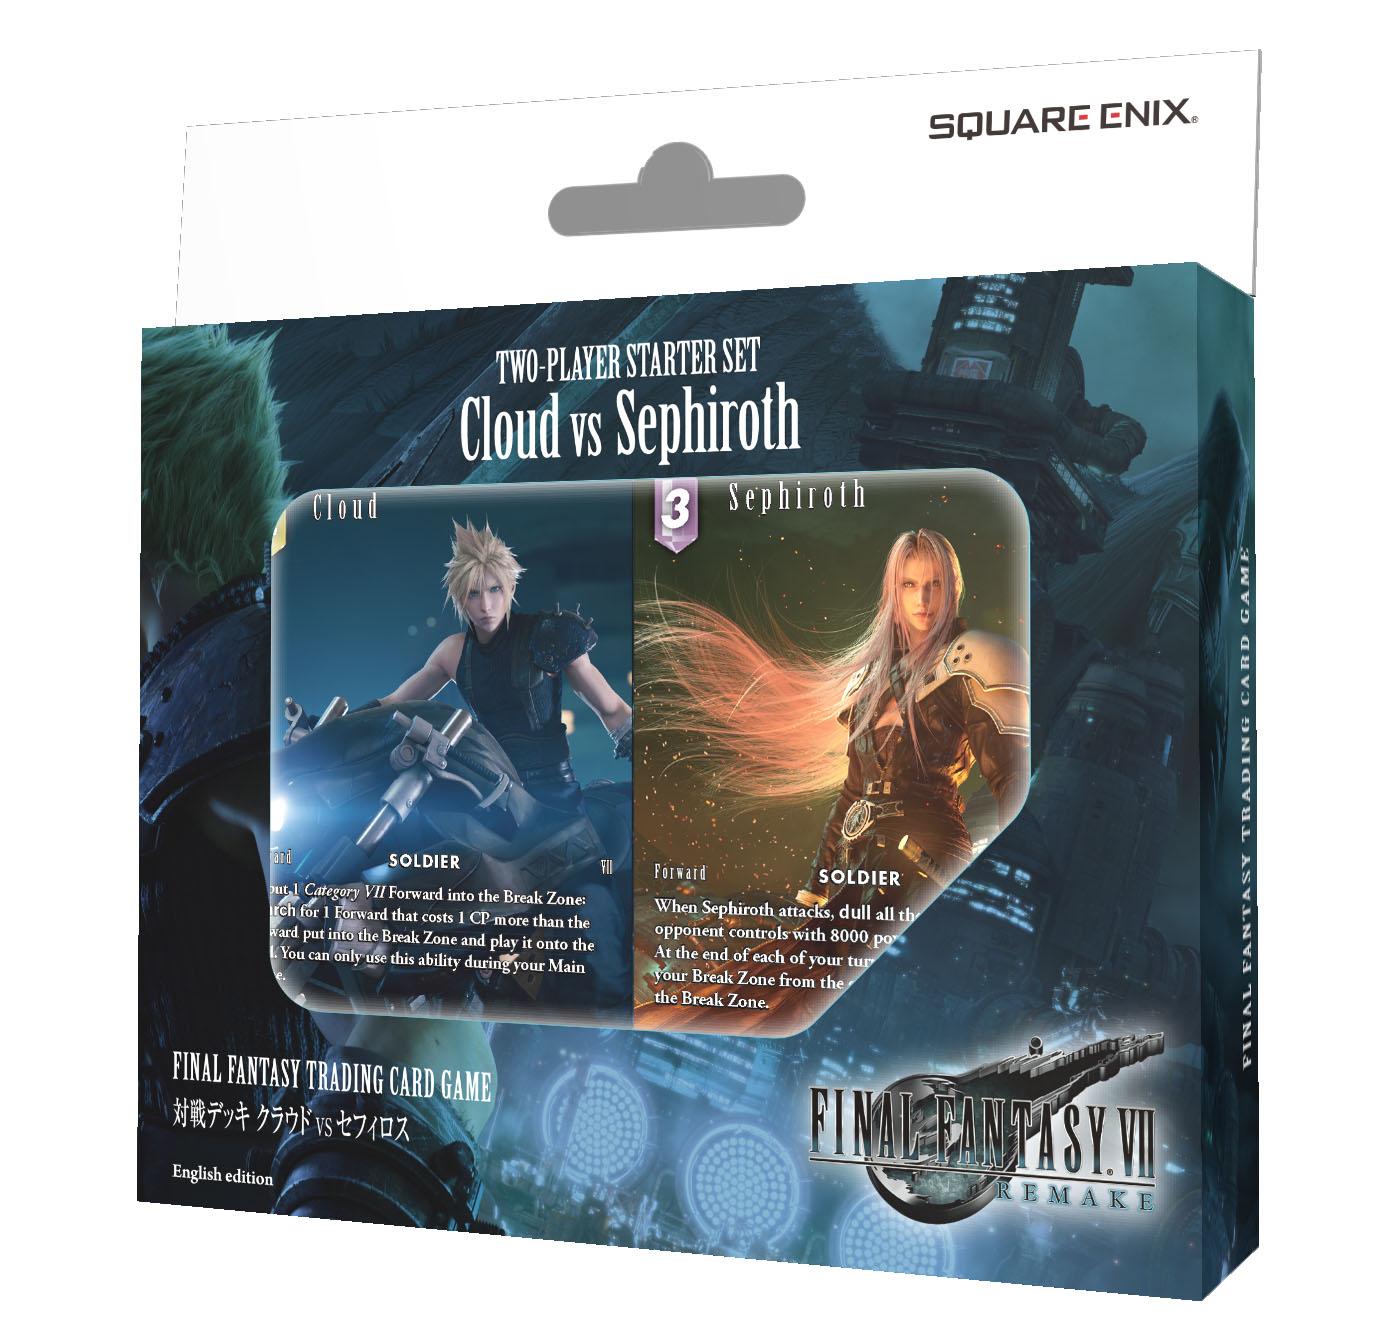 Final Fantasy TCG Opus 11 XI Non-Foil Complete Set Starters Yuna Cloud Sephiroth